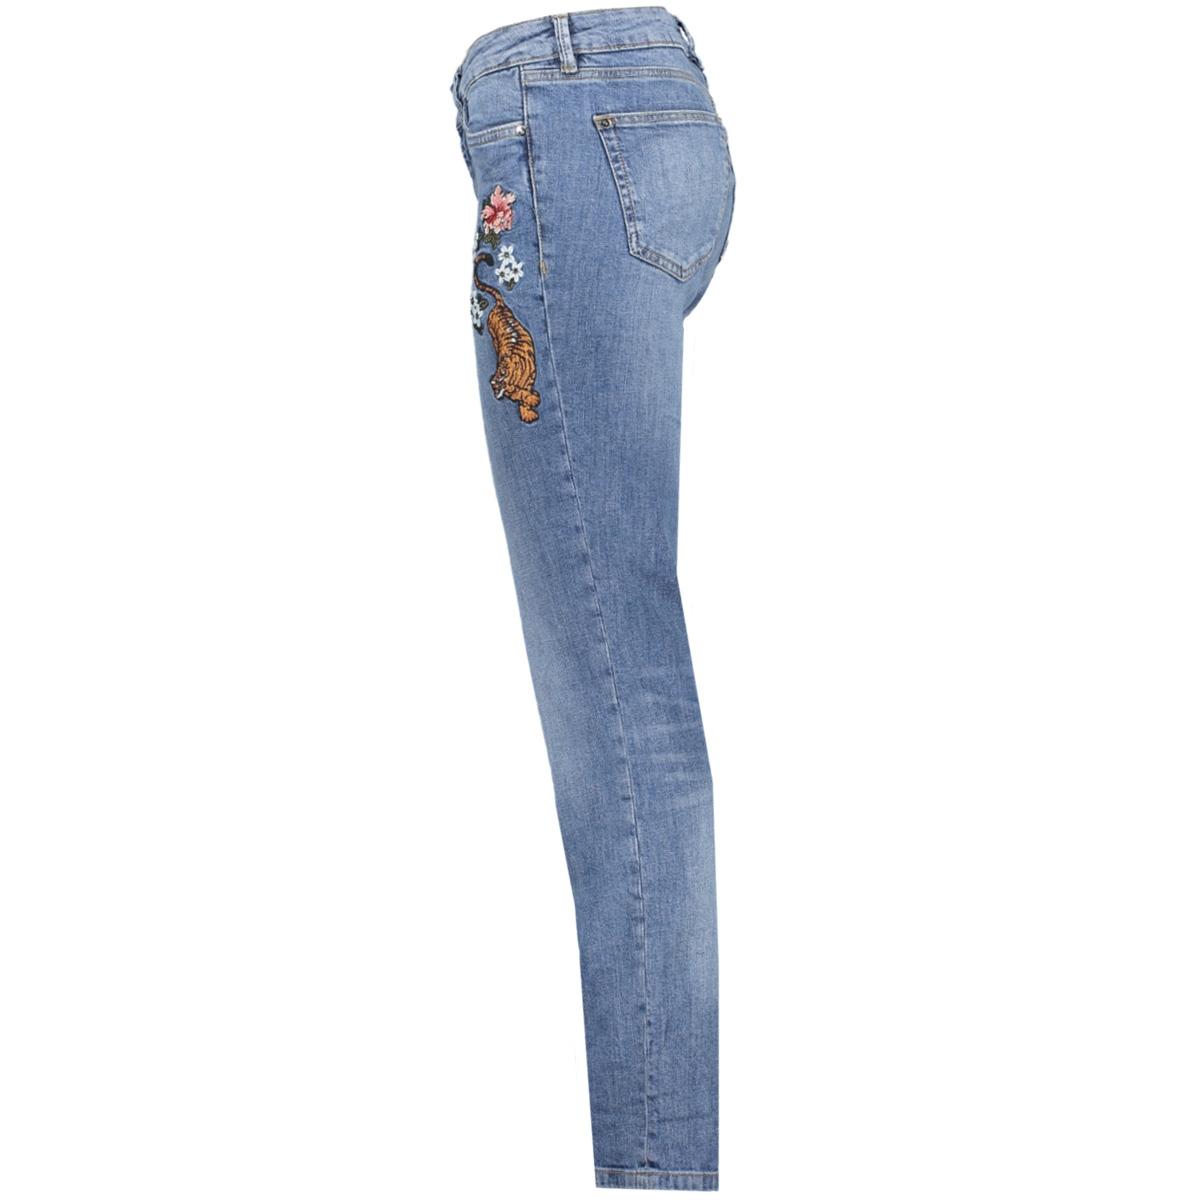 6255038.00.71 tom tailor jeans 1052